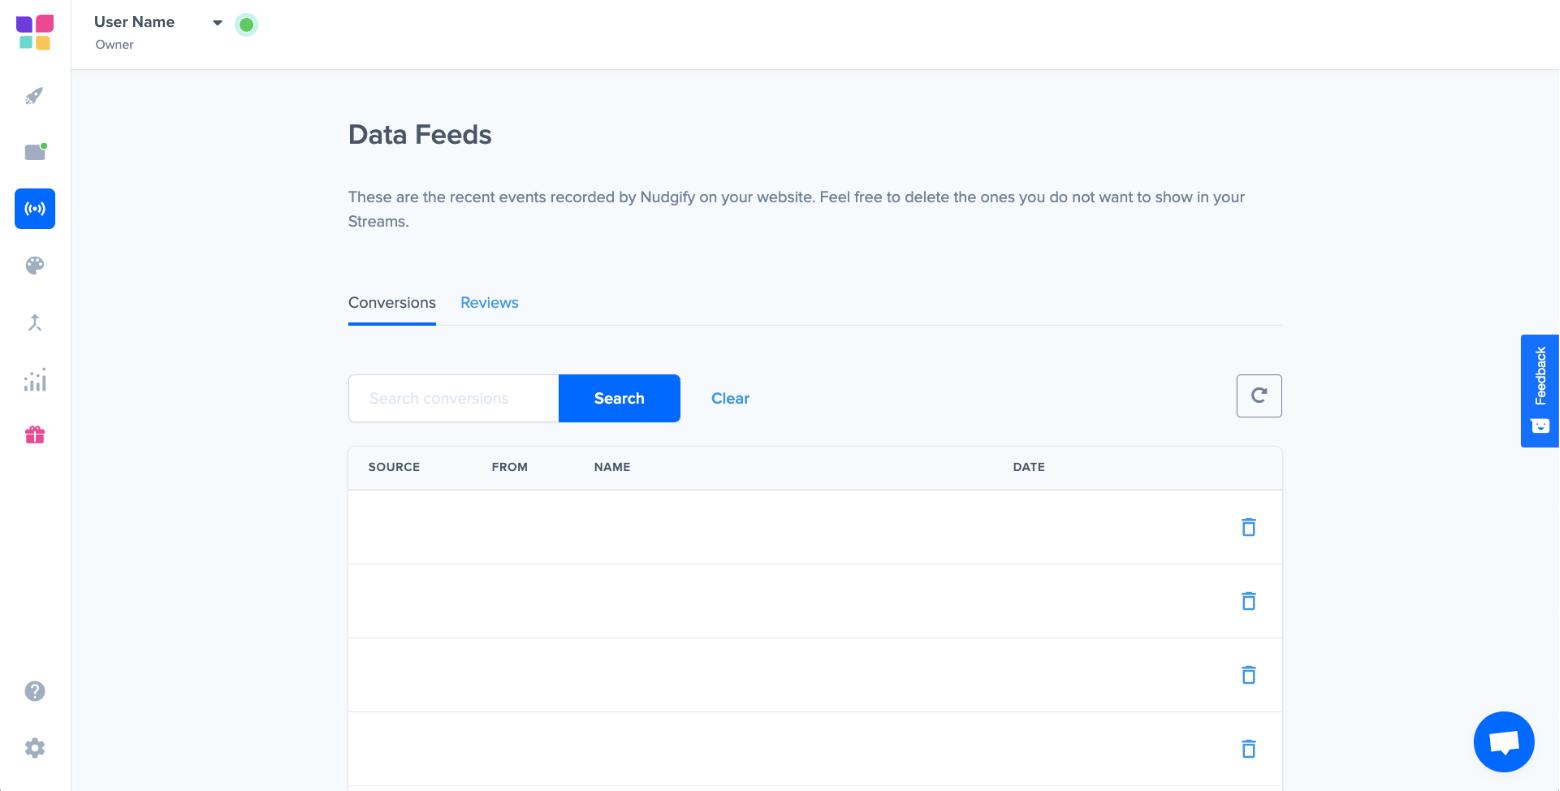 nudgify data feeds